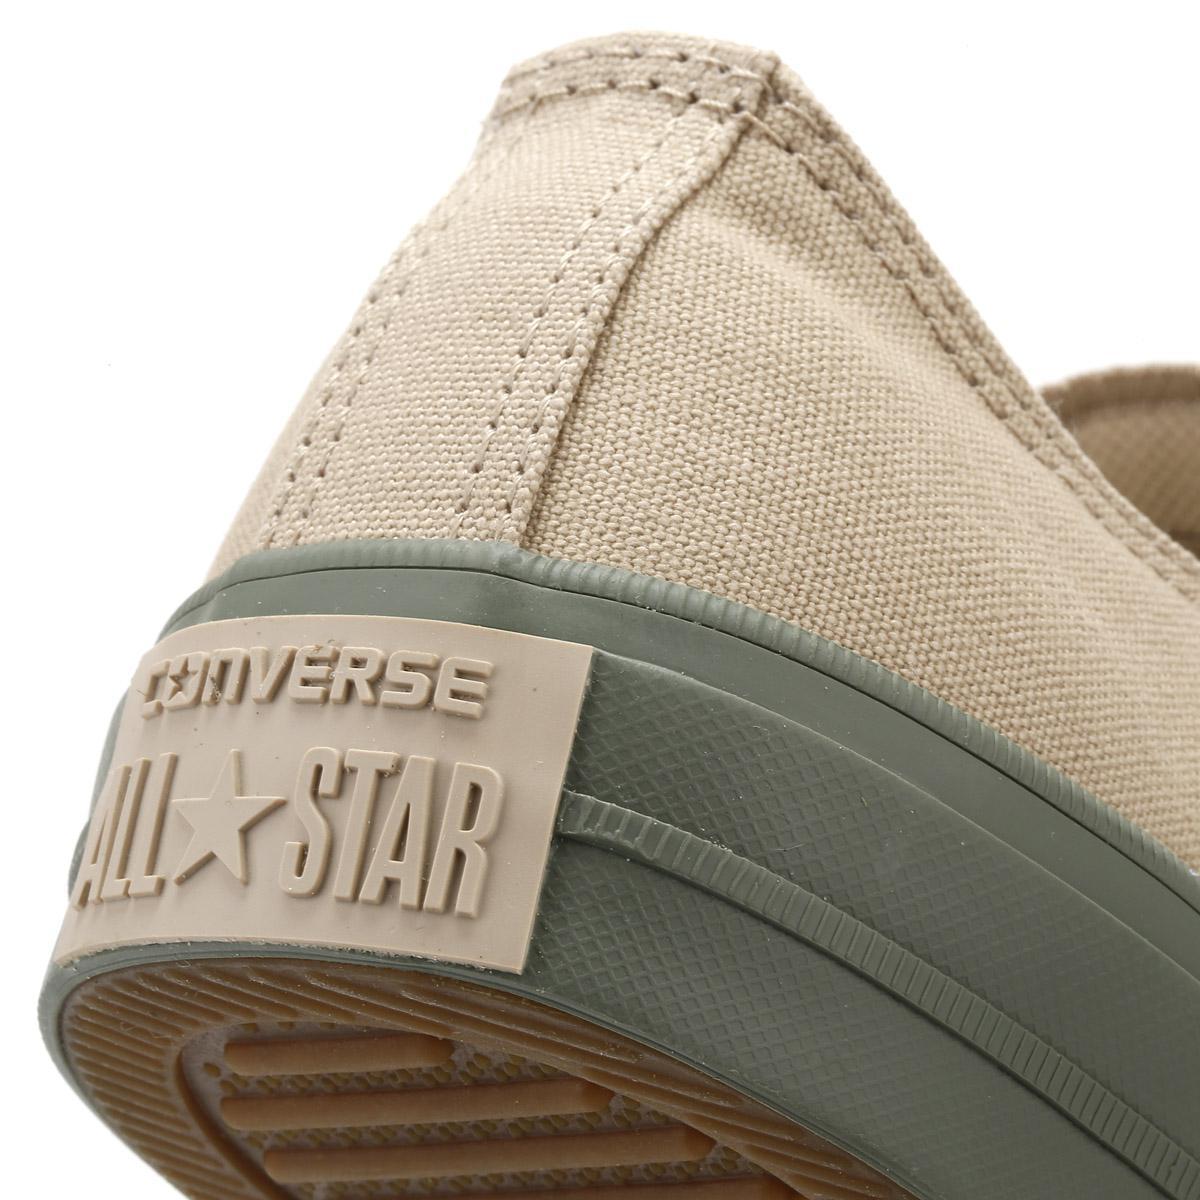 ebf4f519a500 Lyst - Converse All Star Chuck Taylor Ii Mens Ox Vintage Khaki Green ...